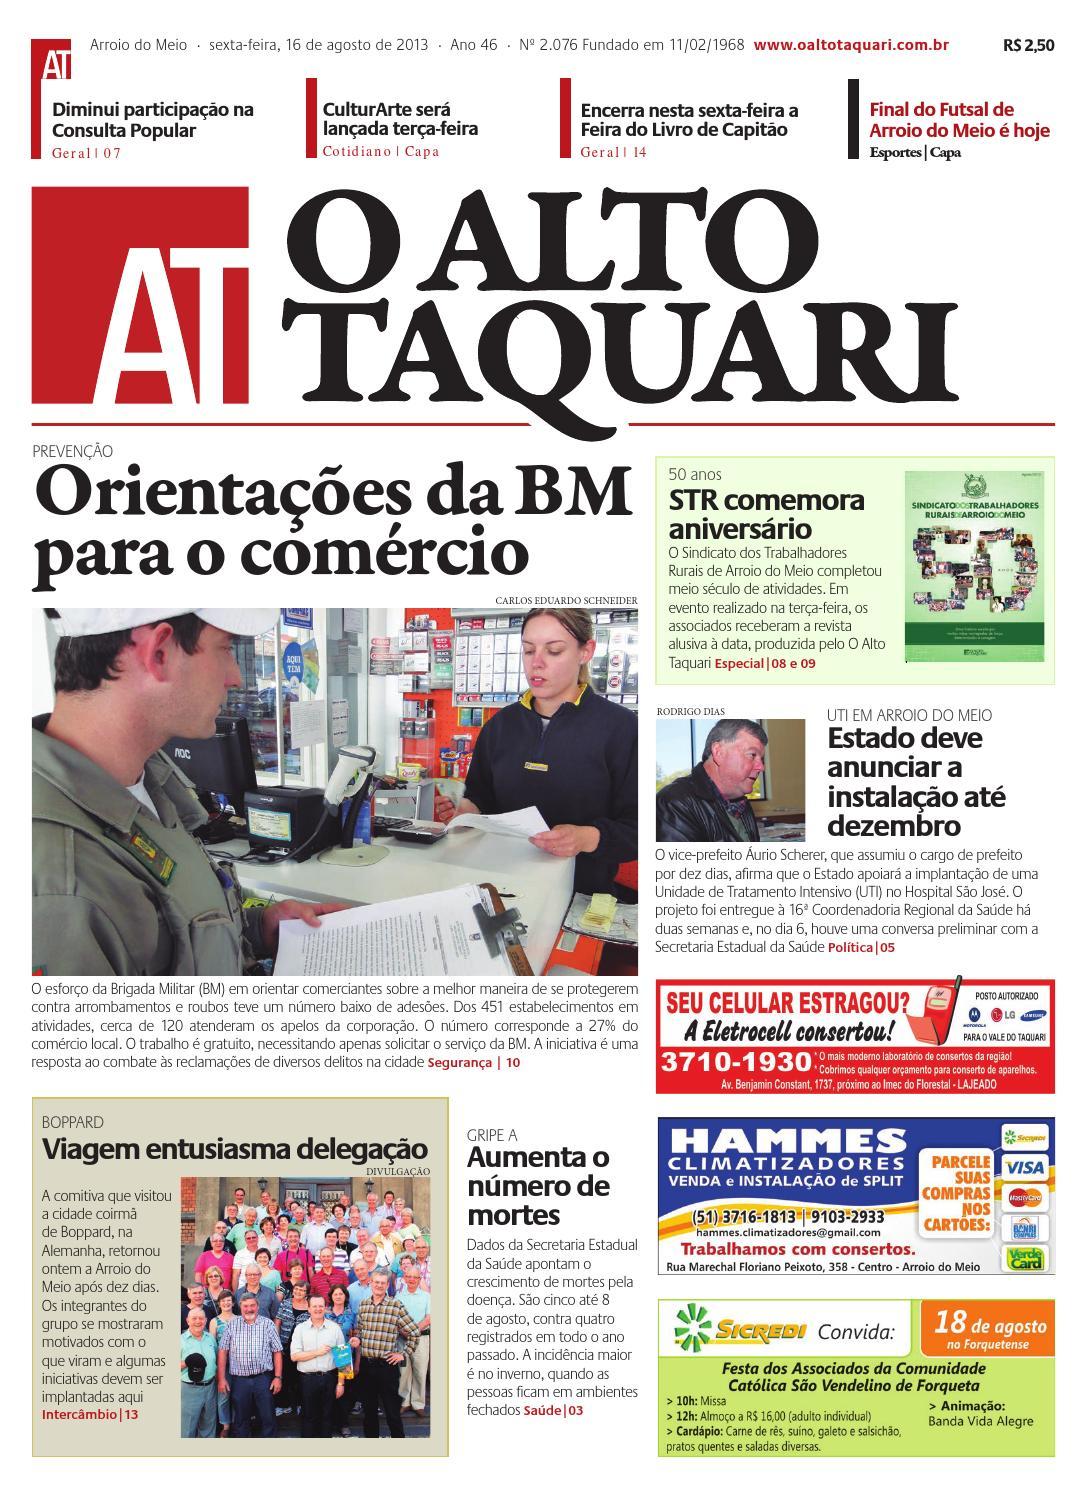 cf4fafcd65bef Jornal O Alto Taquari - 16 de agosto de 2013 by Jornal O Alto Taquari -  issuu